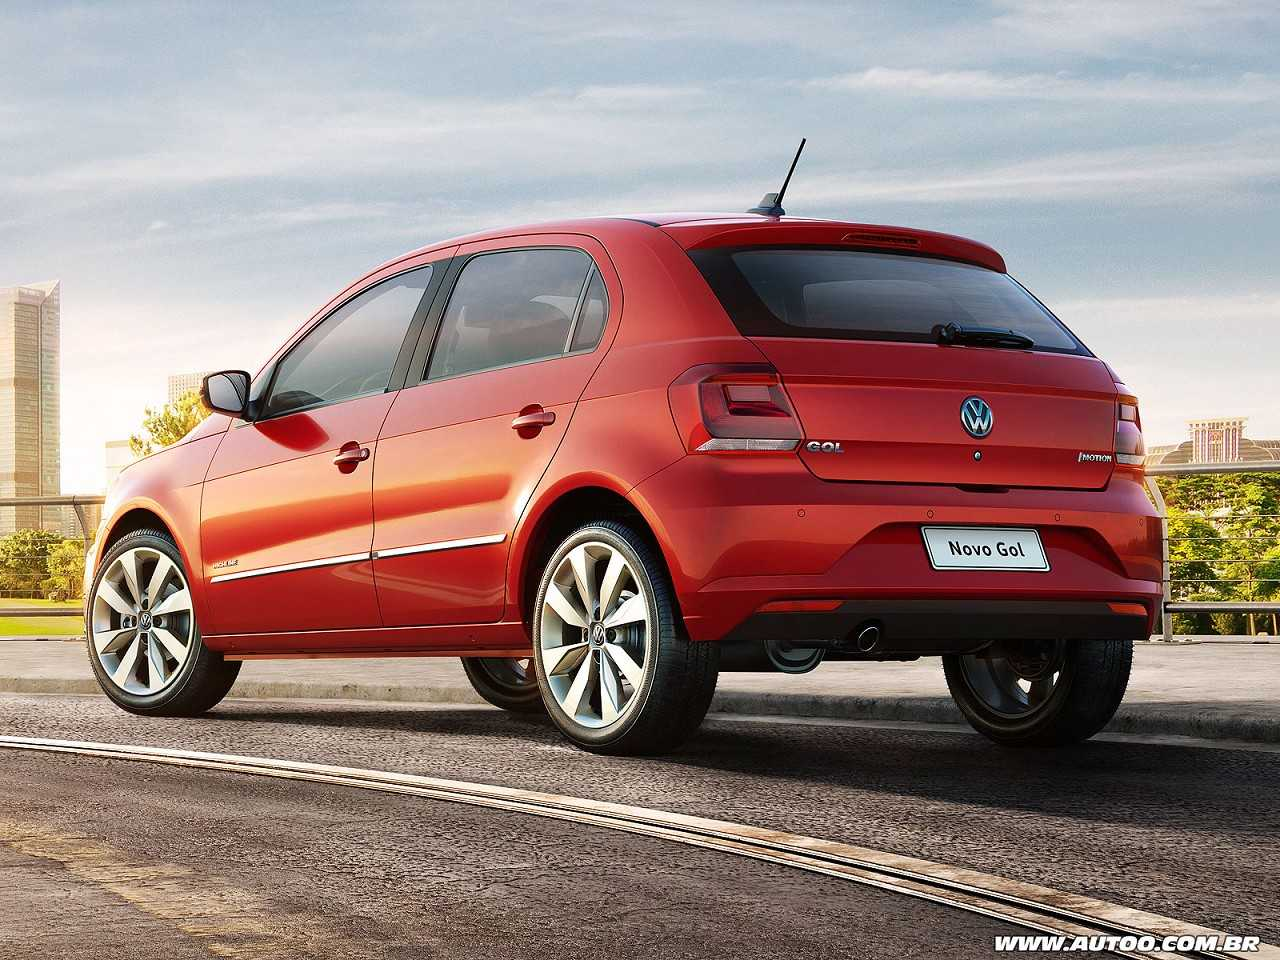 VolkswagenGol 2017 - ângulo traseiro